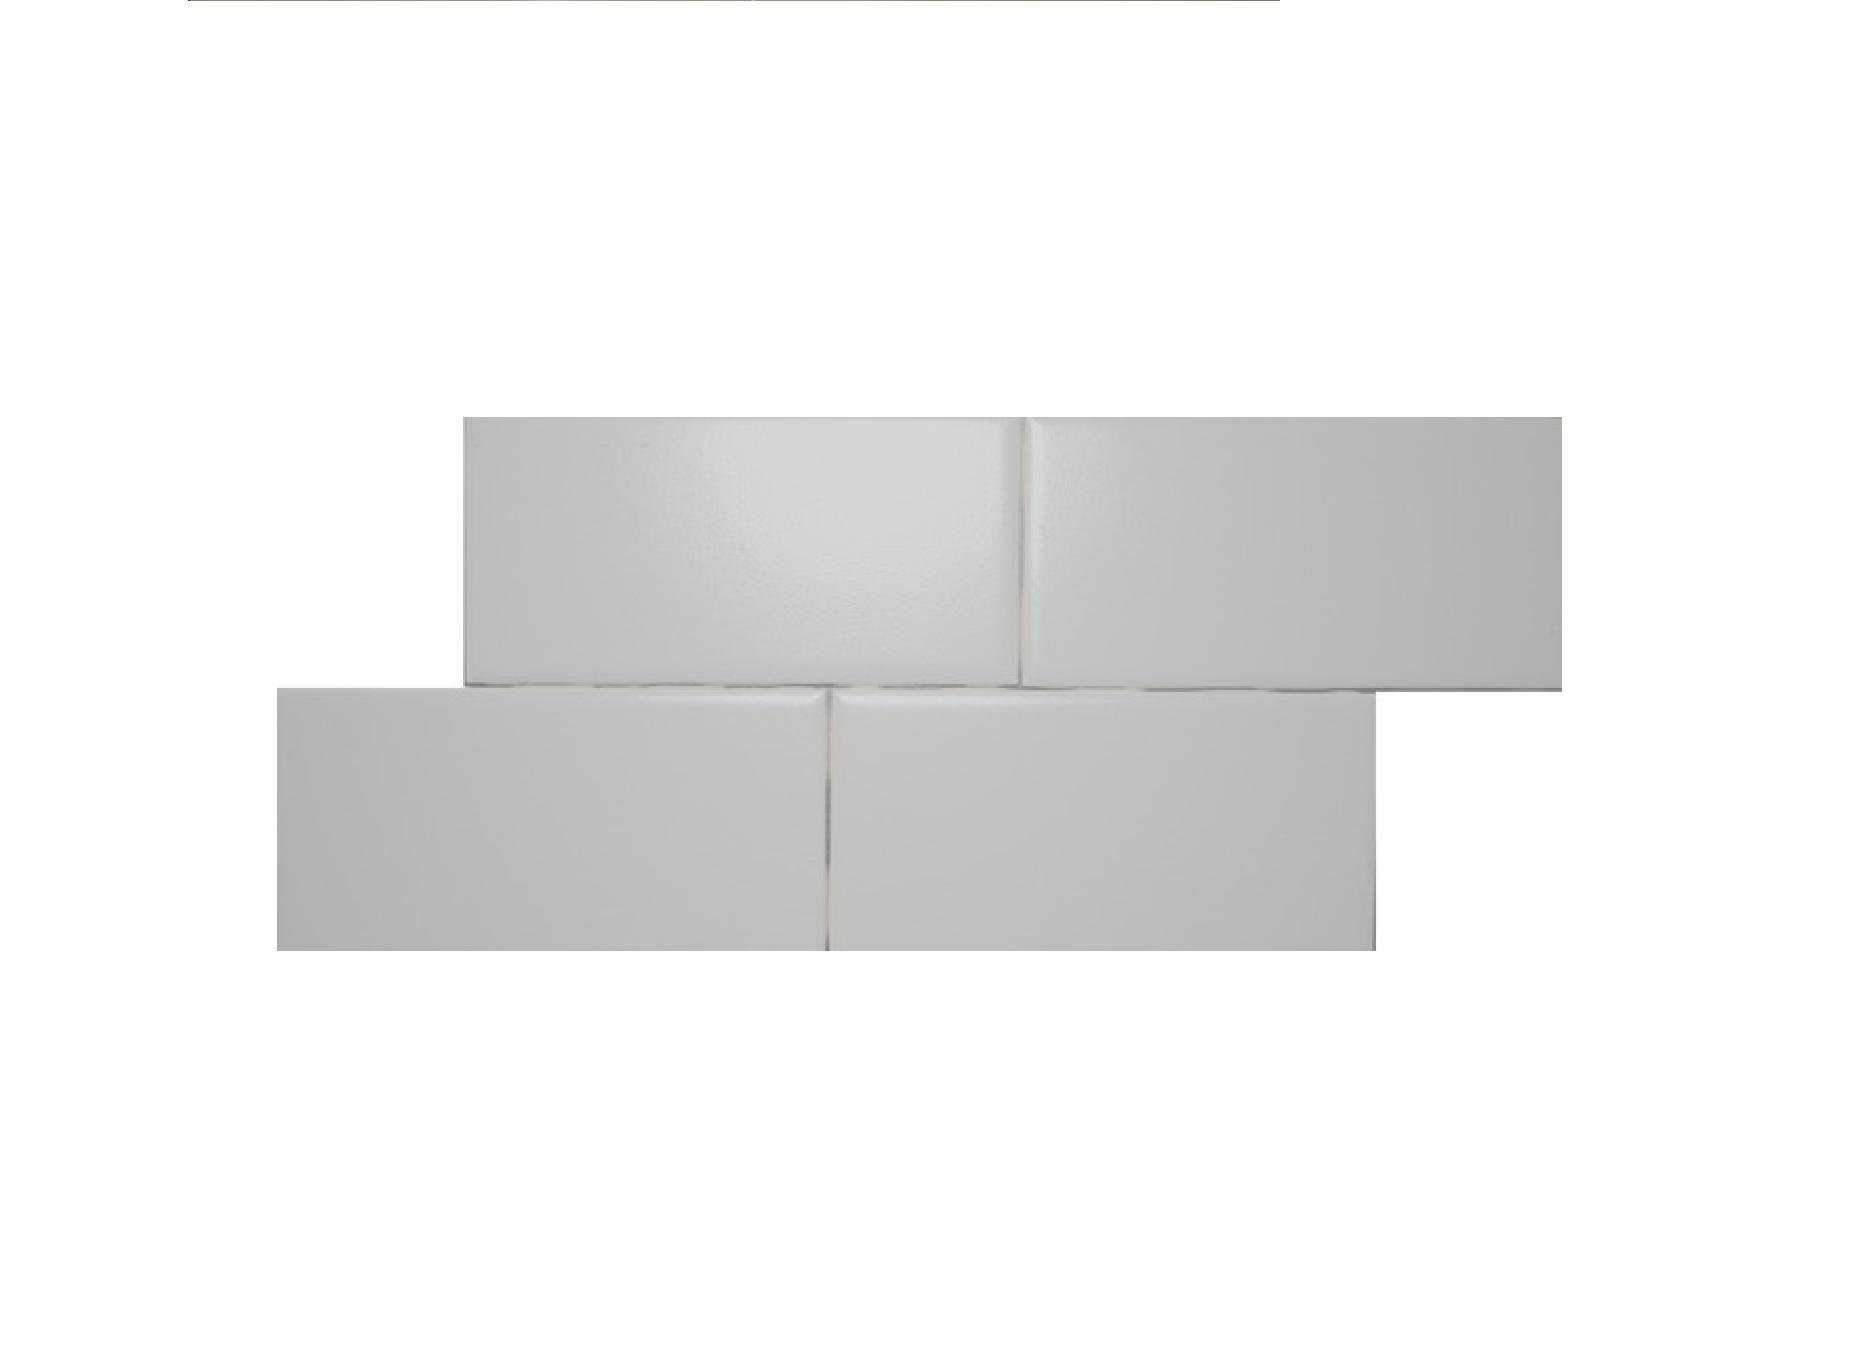 Cc tender gray matte 3x6 subway tile tigard carpet amp tigard ceramic subway tile 3x6 dailygadgetfo Choice Image